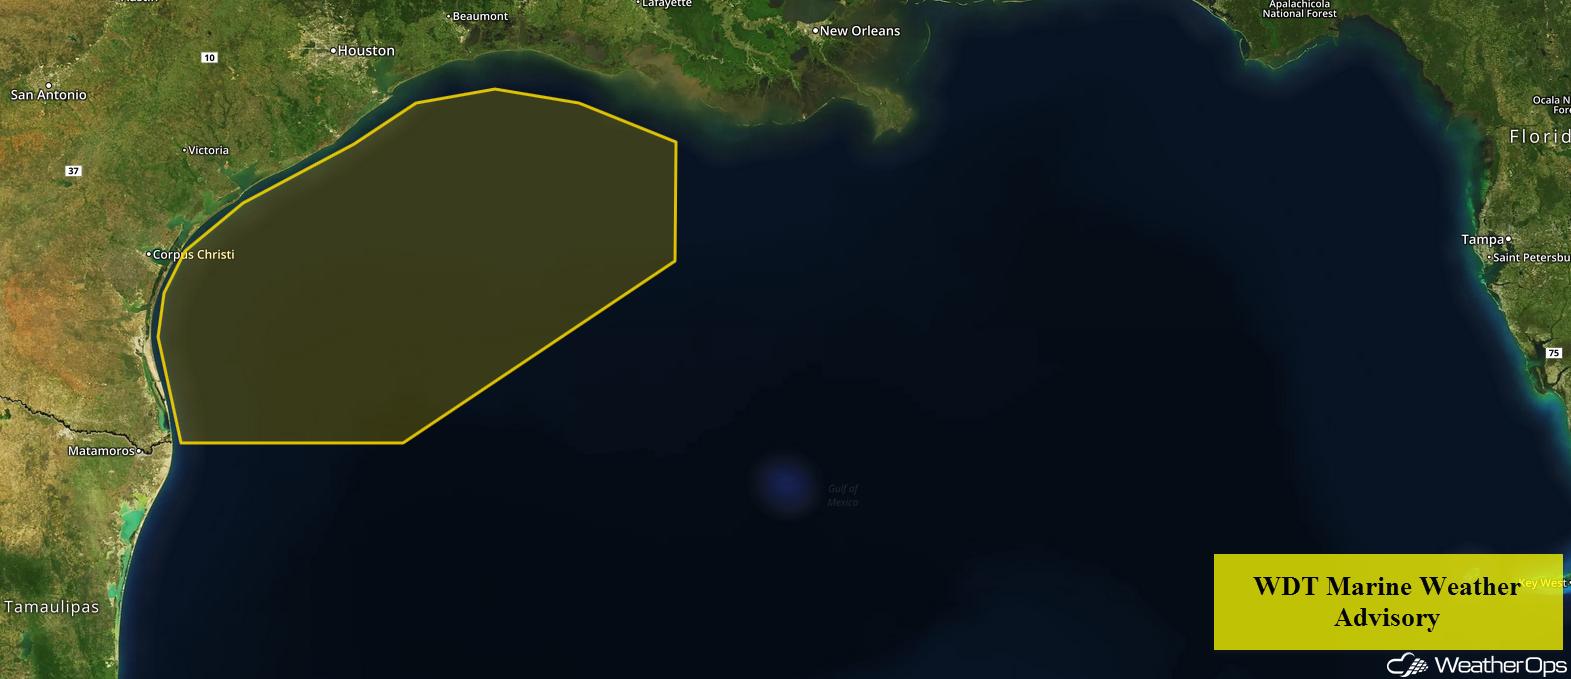 WDT Marine Weather Advisory 4/18/18